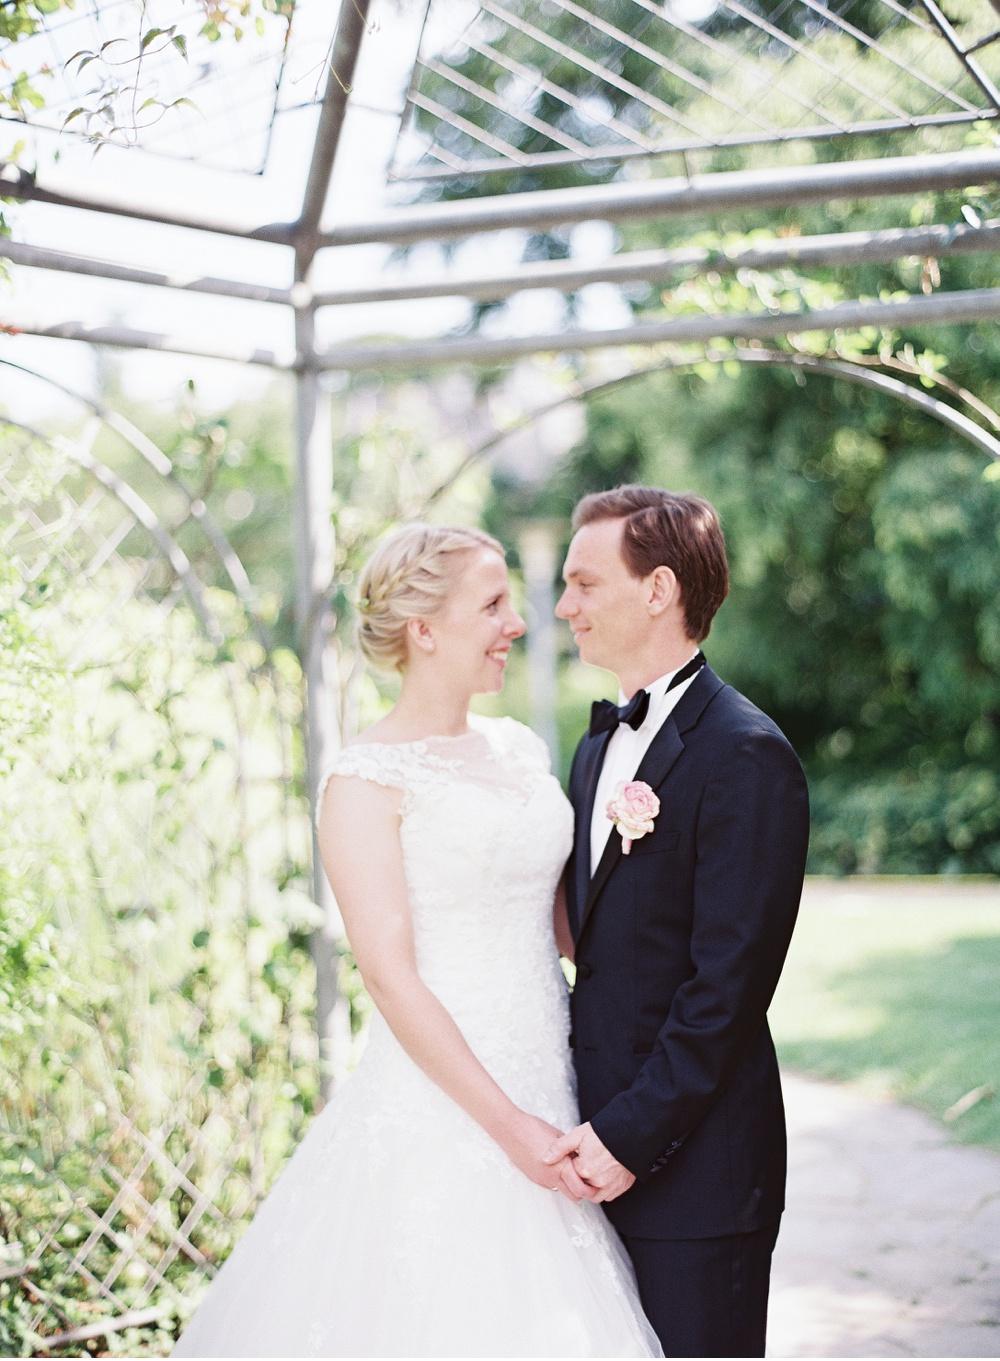 Classy_Norwegian_Wedding_WeddingPhotographer©MadalinaSheldon_0013.jpg